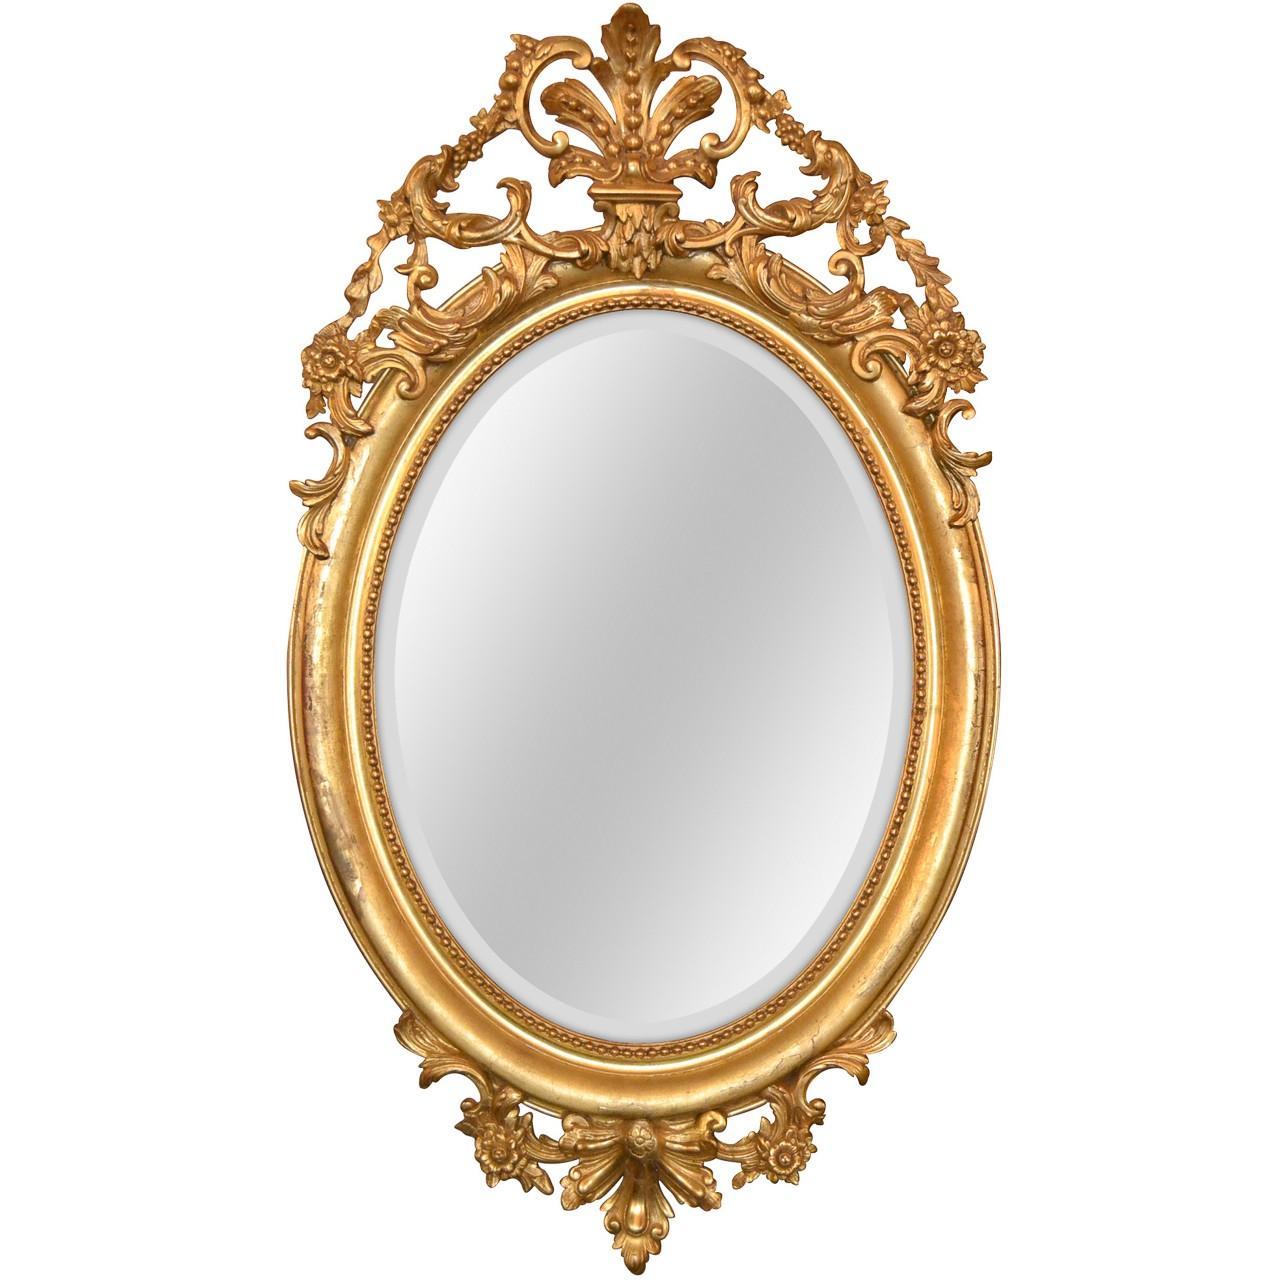 19th Century French Napoleon III Giltwood Mirror